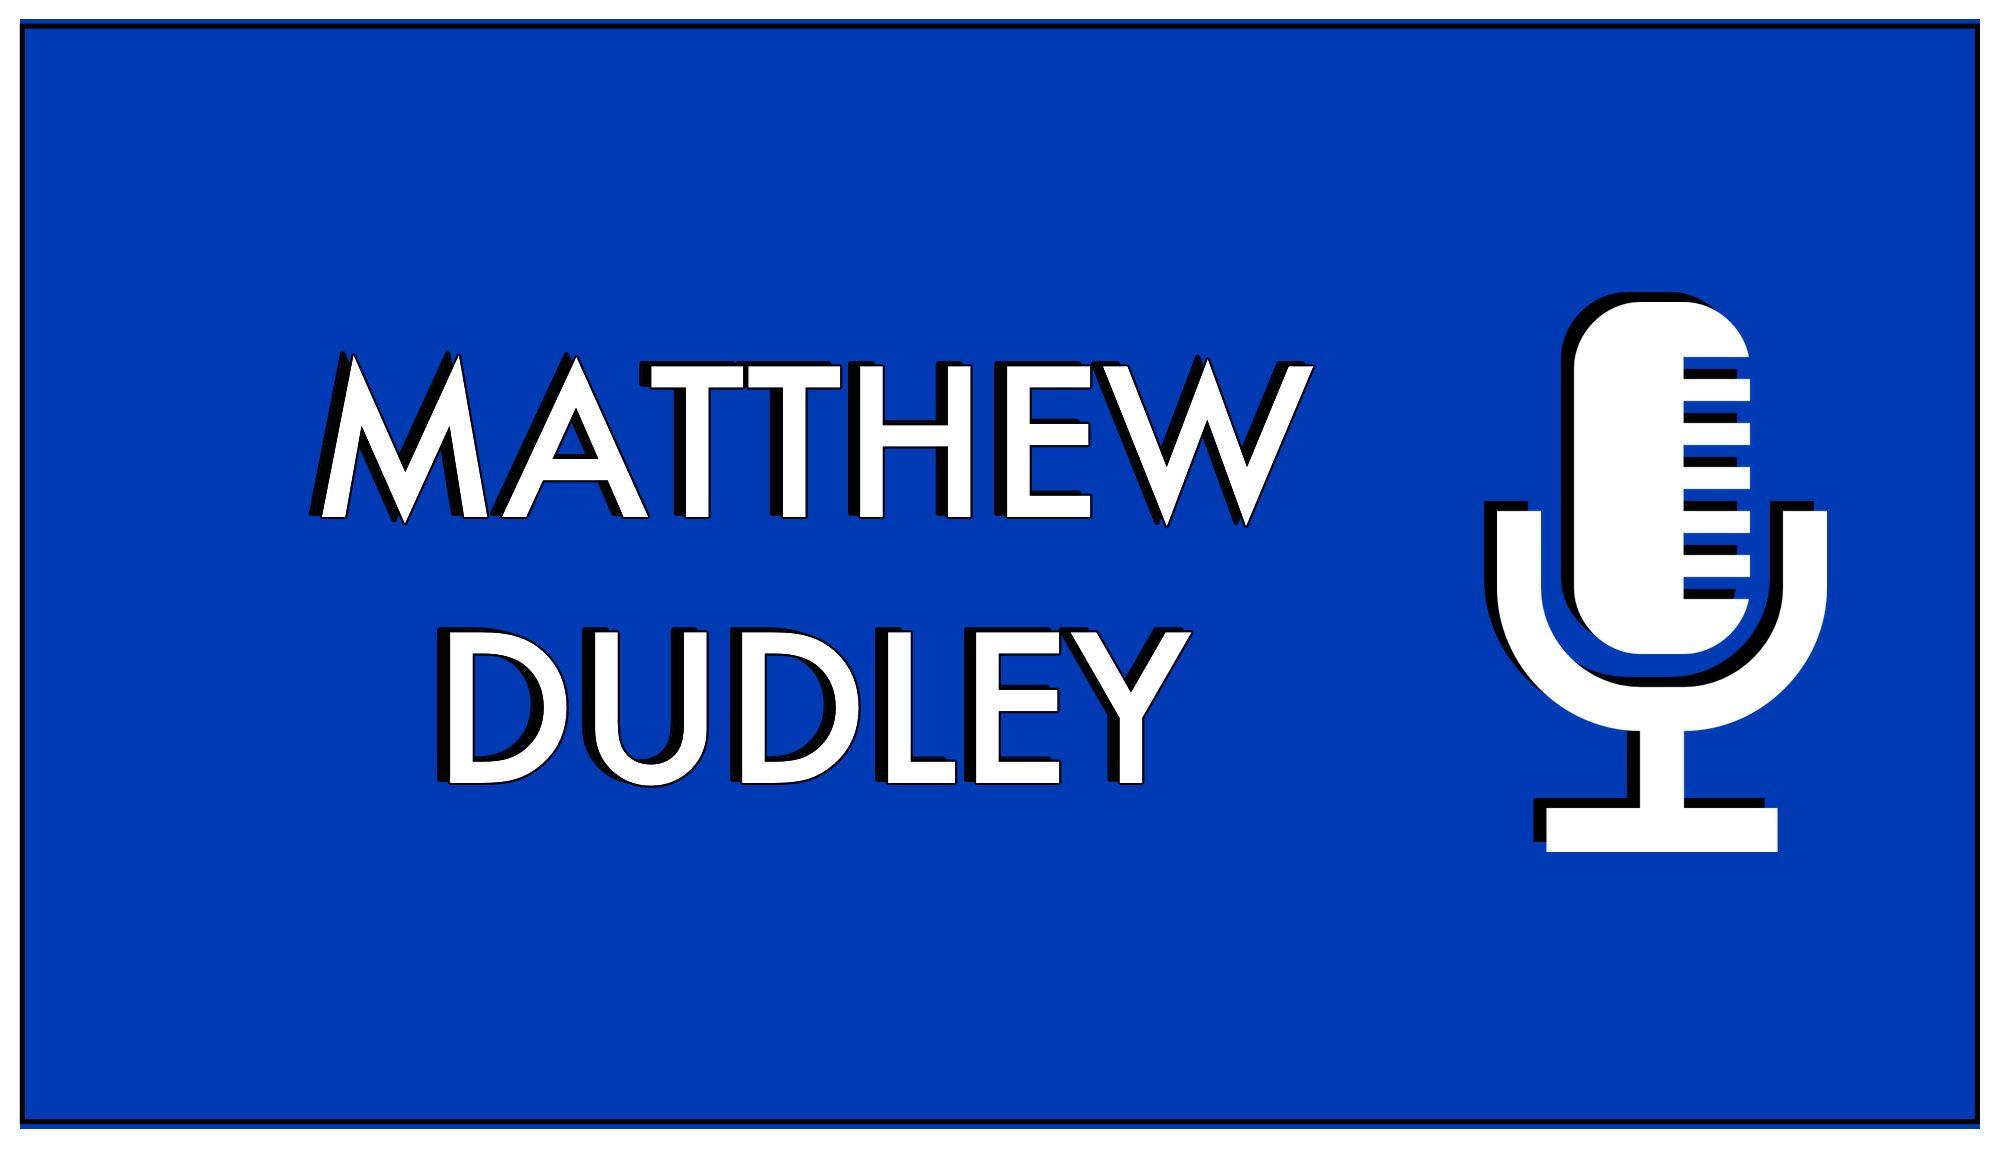 Matthew Dudley